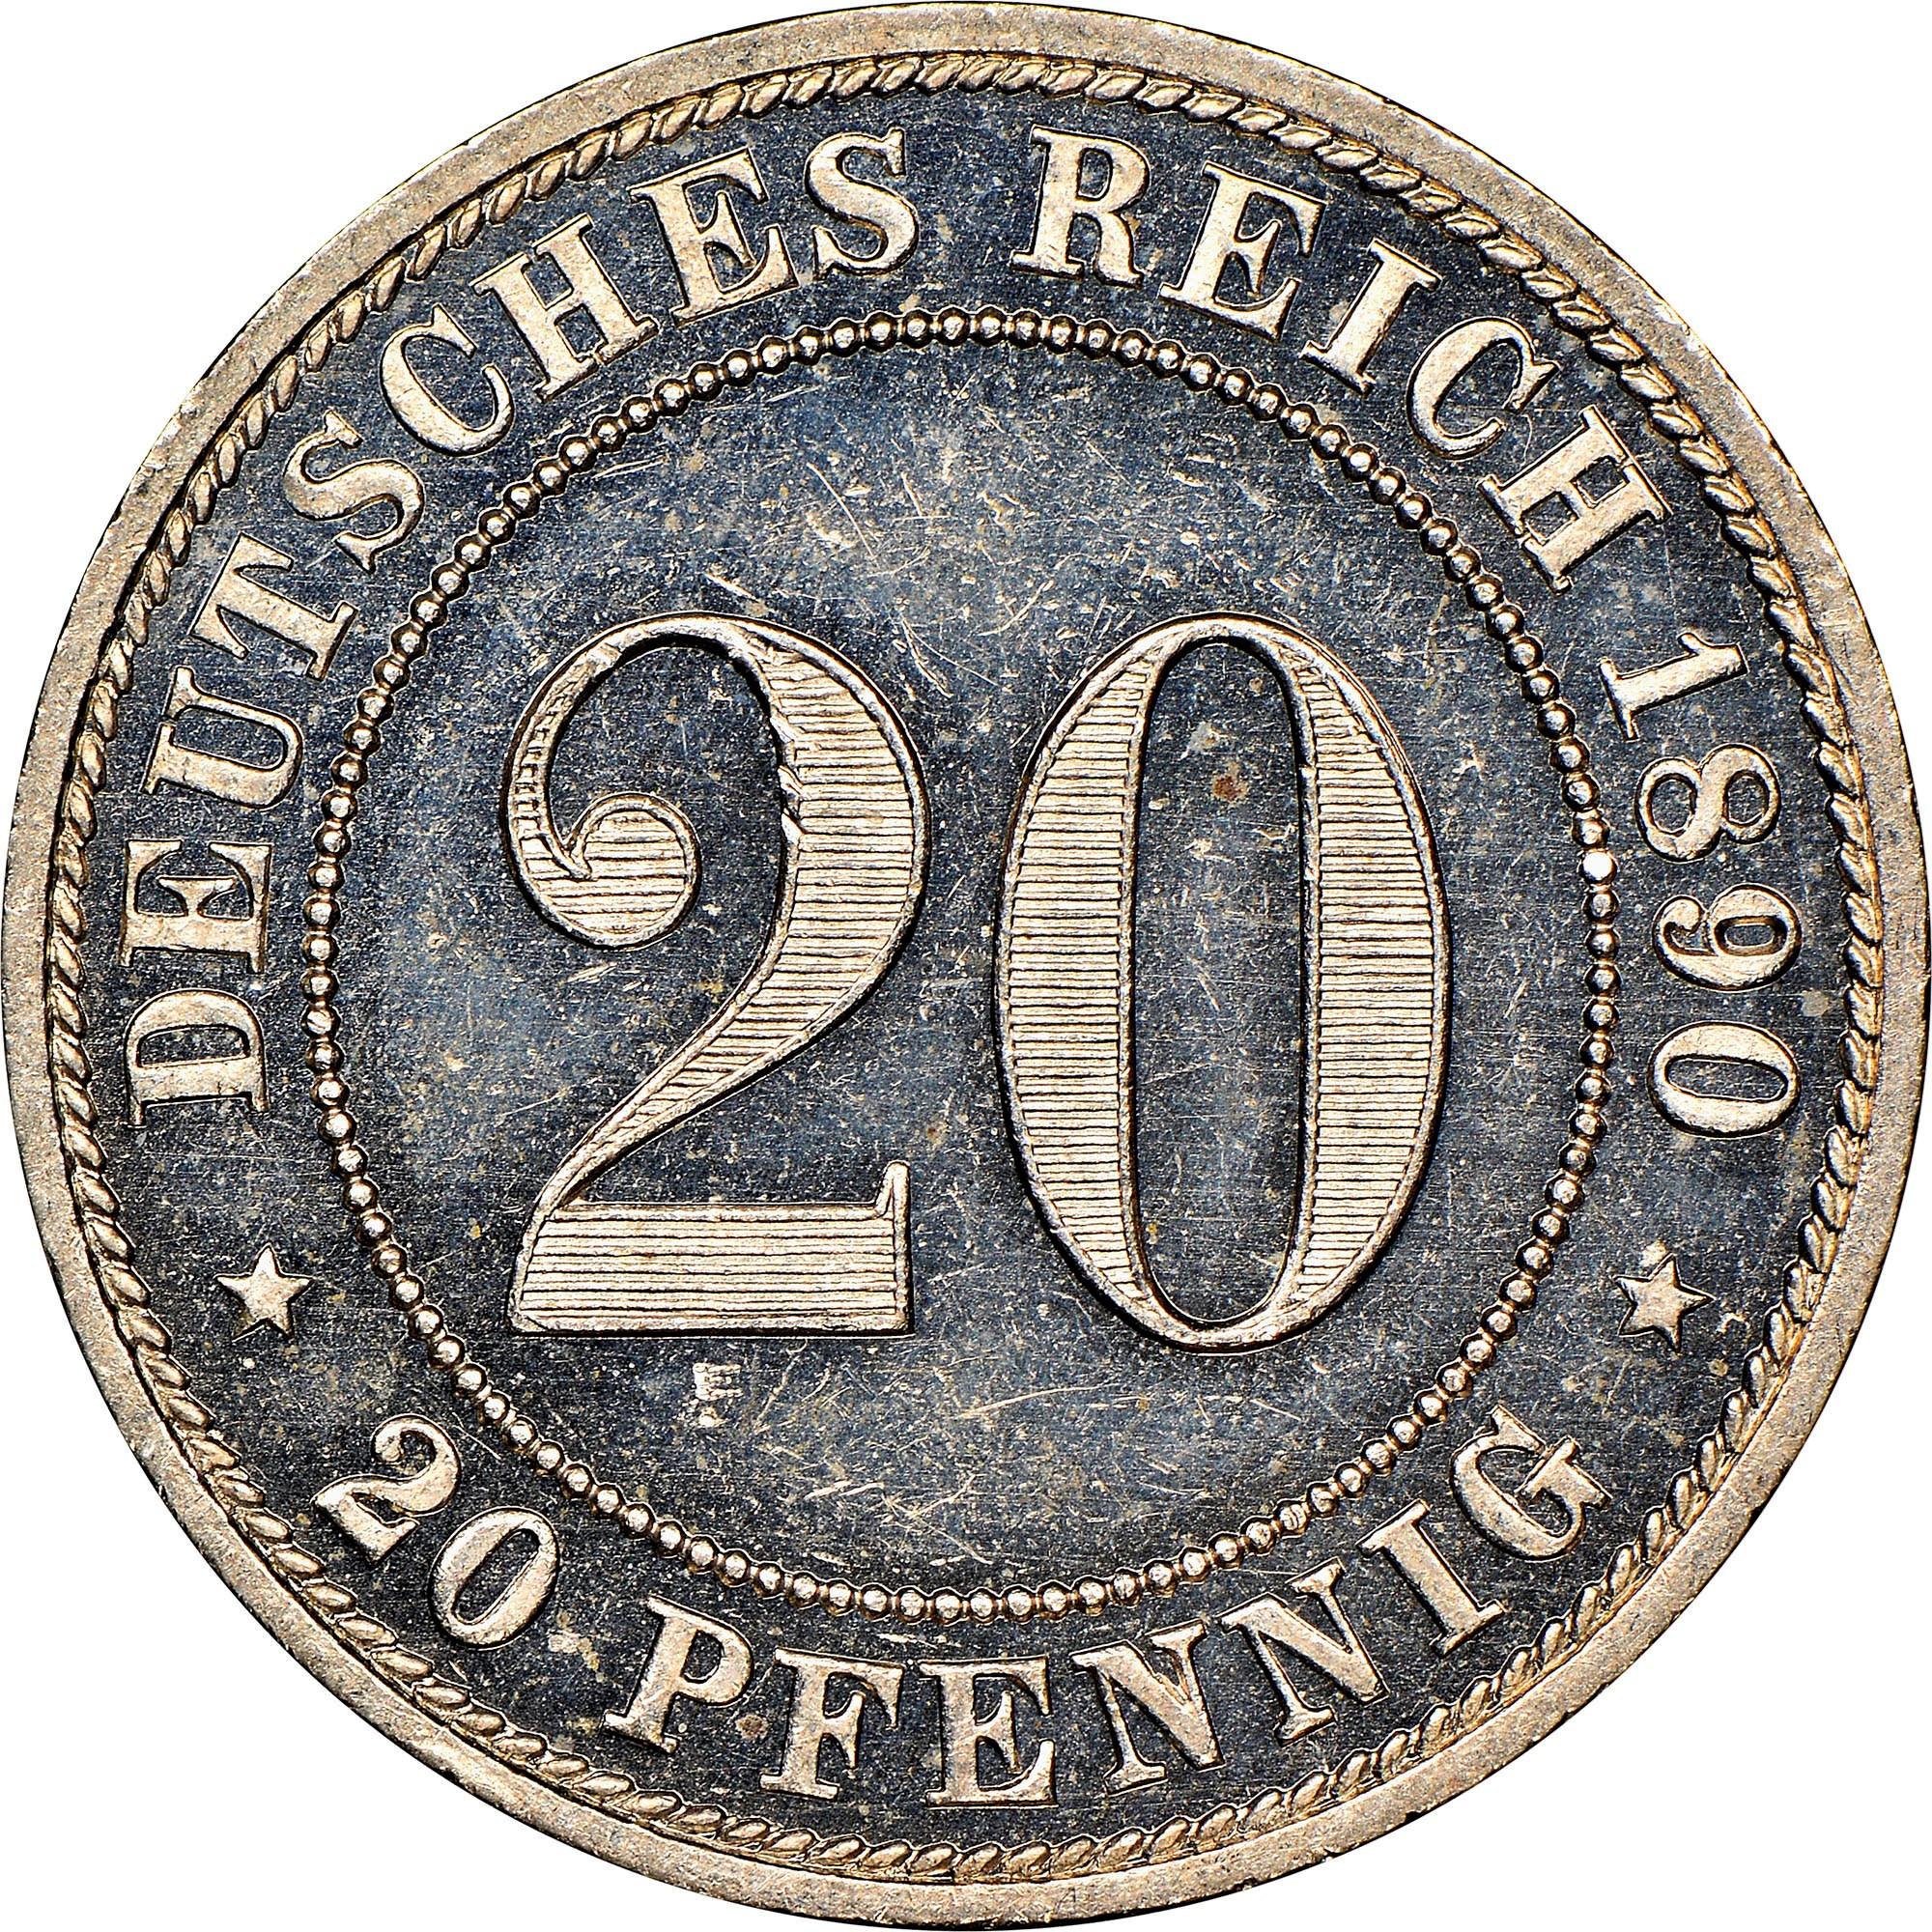 Germany - Empire 20 Pfennig reverse